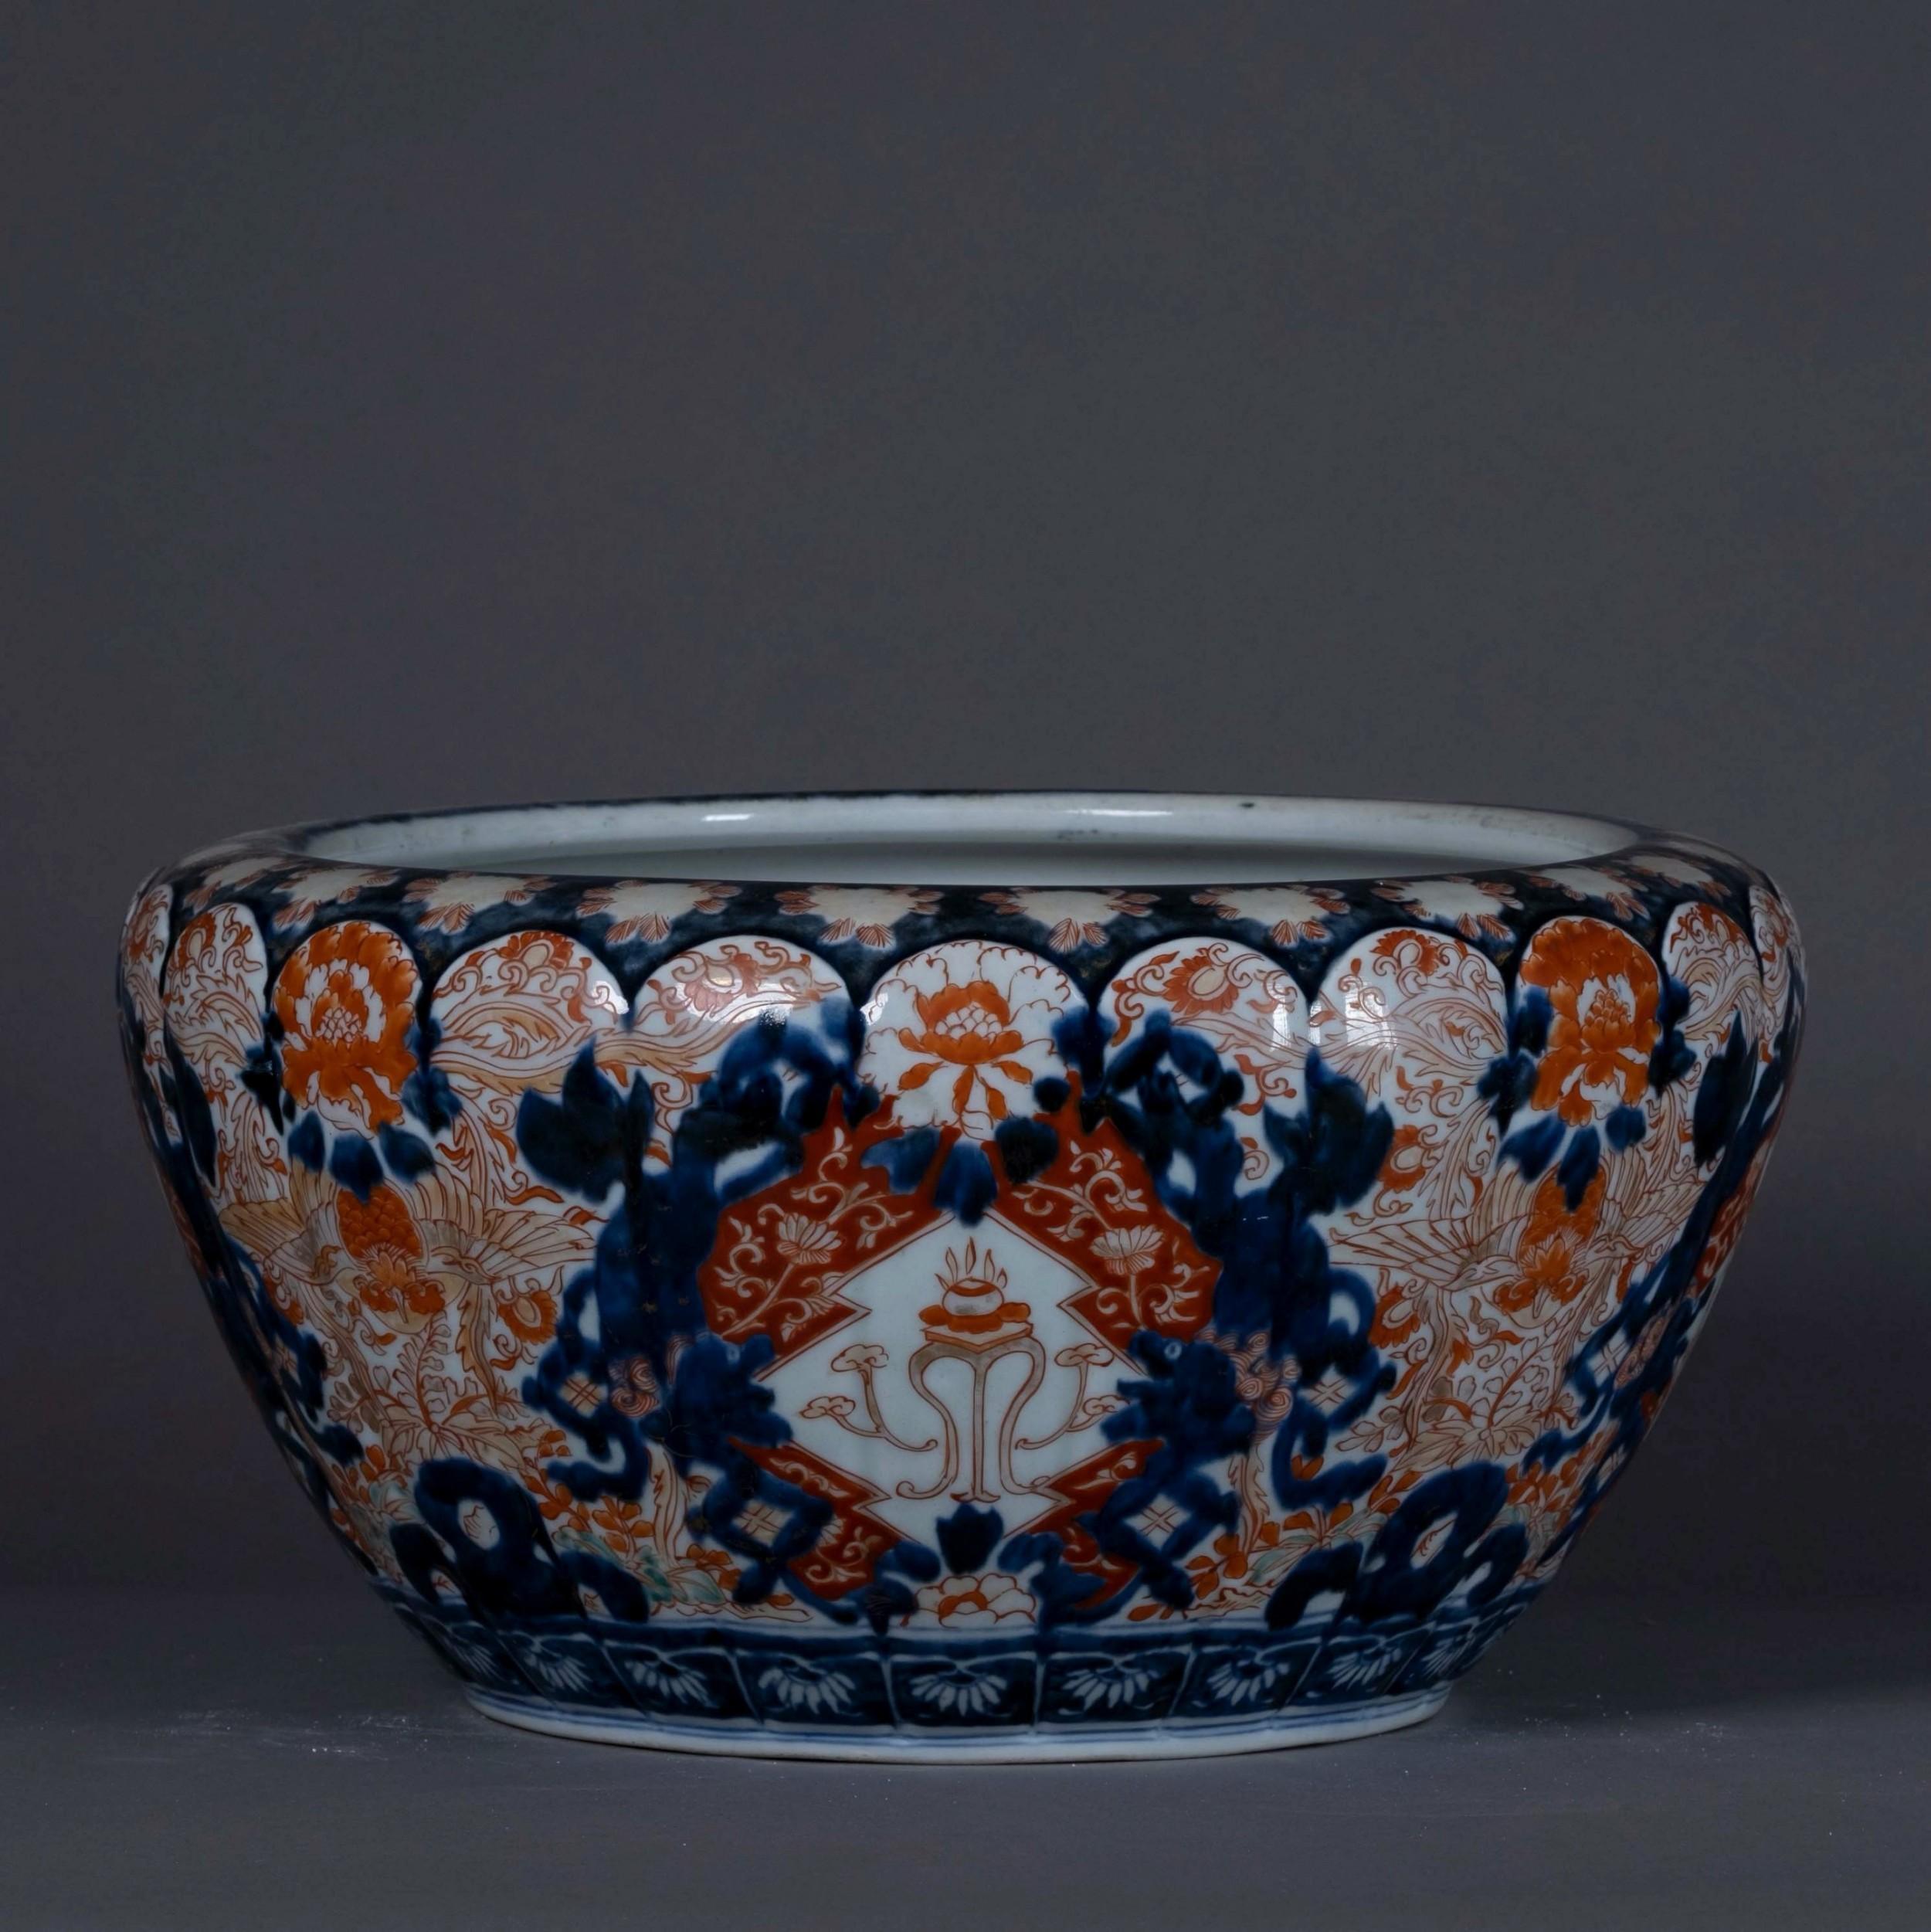 large 19th century imari porcelain bowl